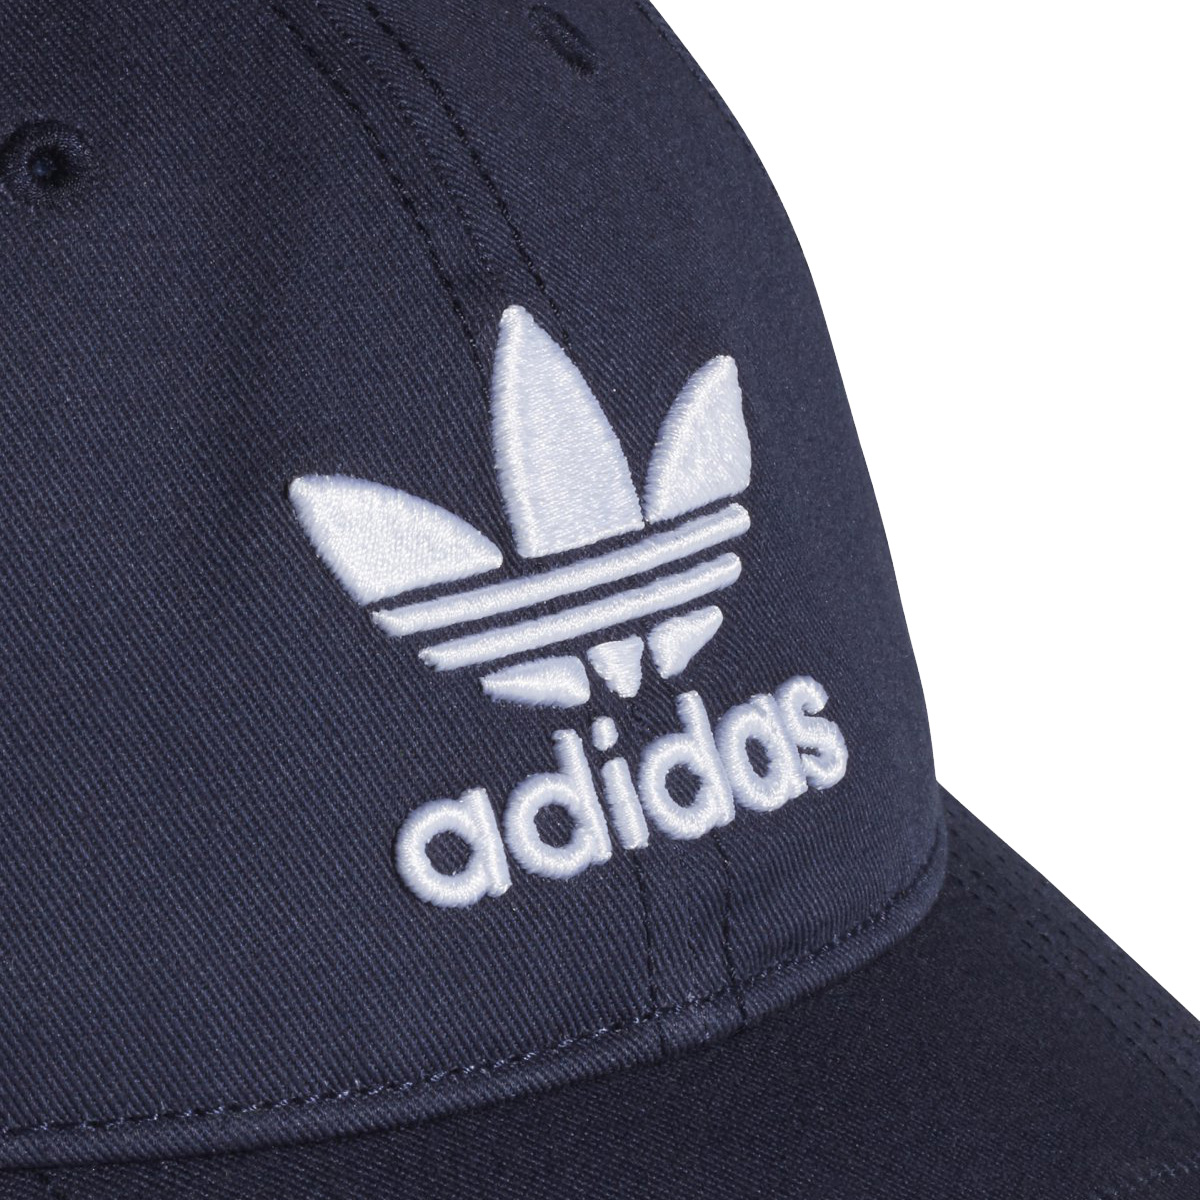 adidasOriginalsTREFOILCAP(アディダスオリジナルストレフォイルキャップ )CollegiateNavy White 帽子 18SS- ad8066d5543c